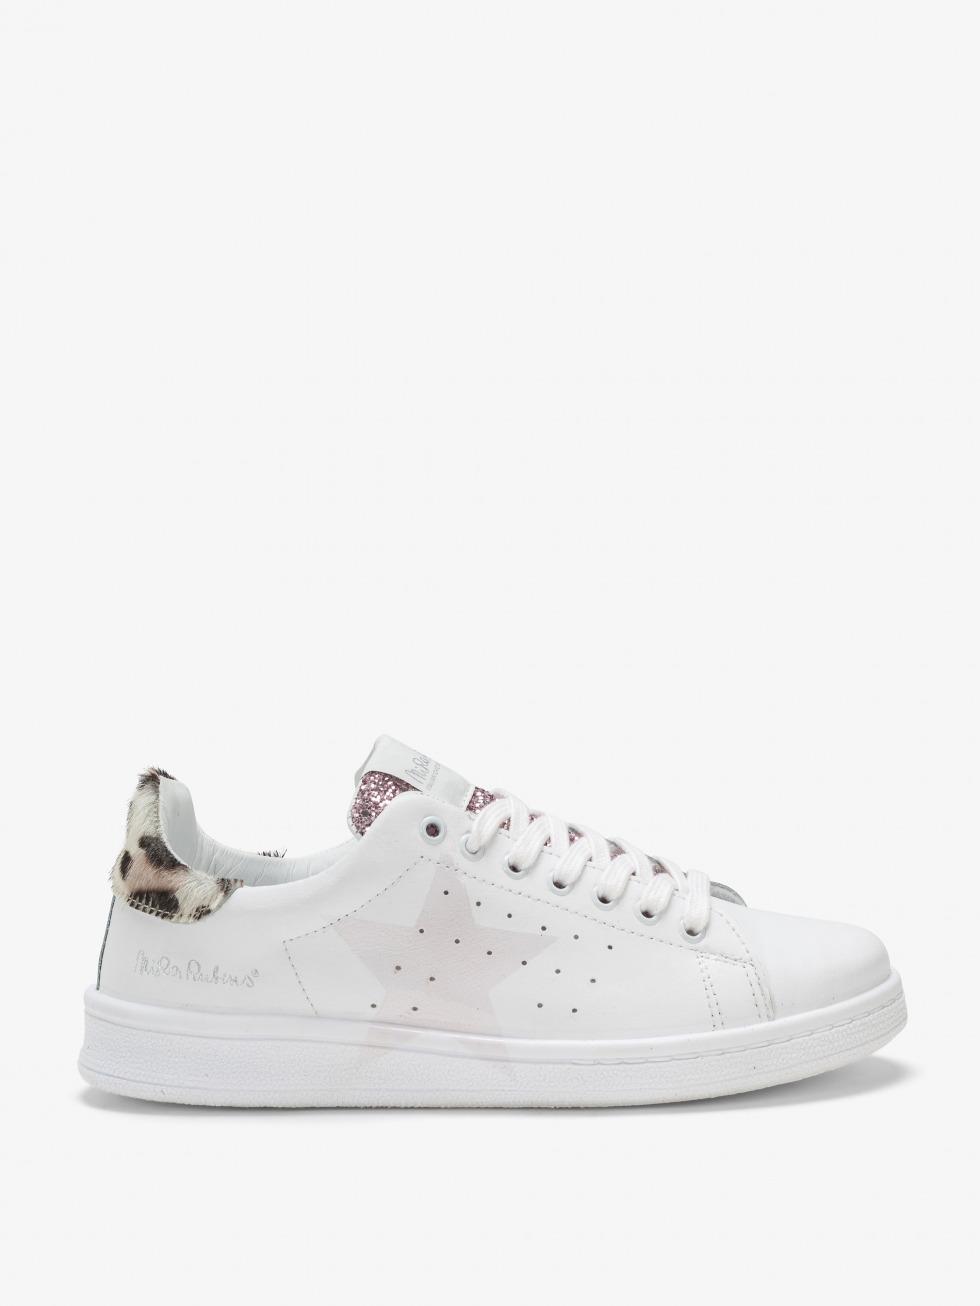 Daiquiri Babe Chic Sneakers - Star